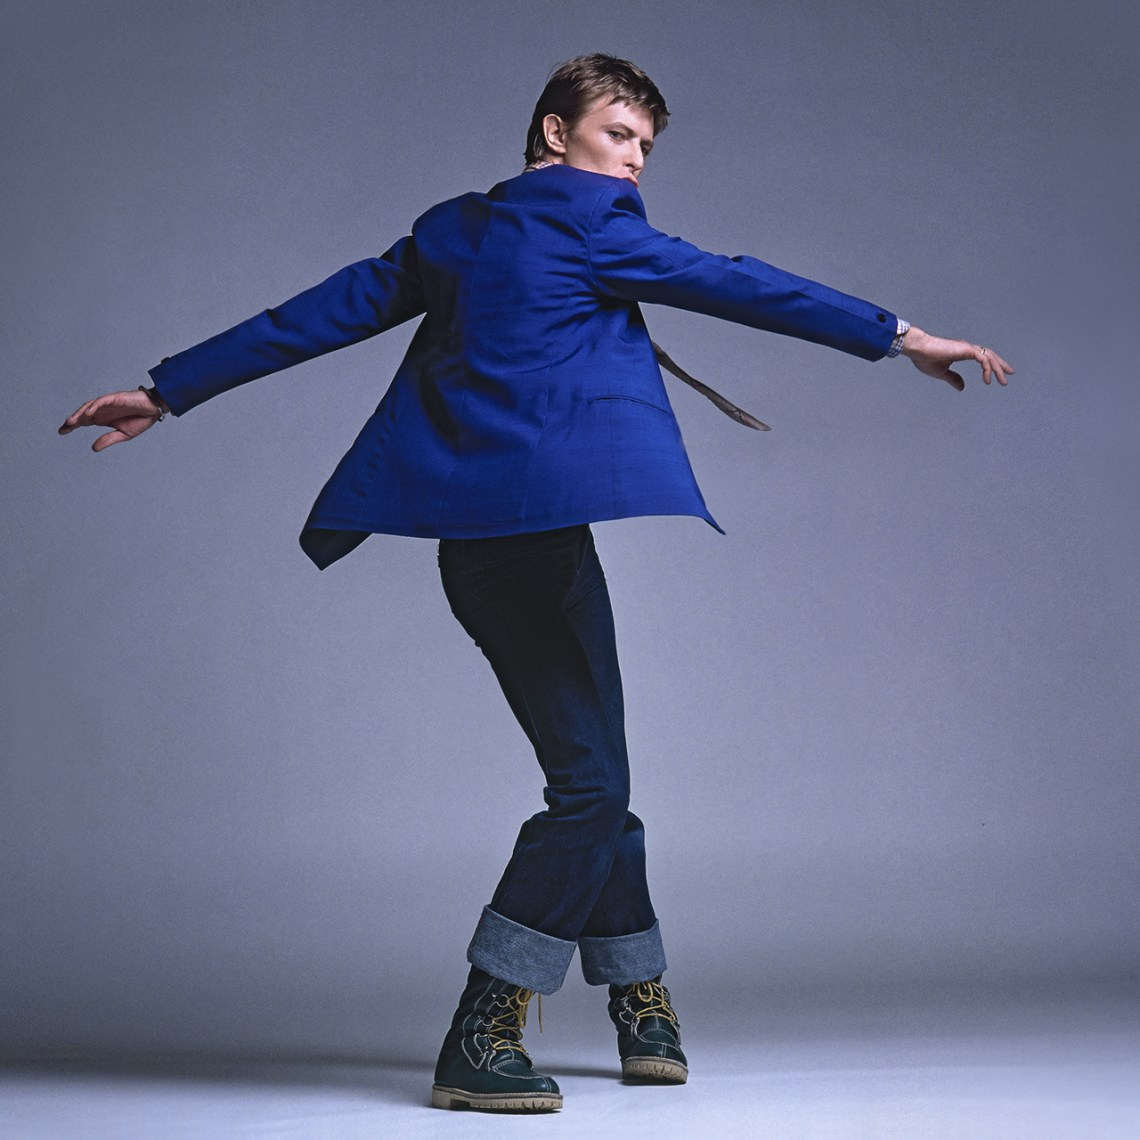 Bowie-Flat.-twisting.3.Colour.-Square.Arrowsmith.jpg